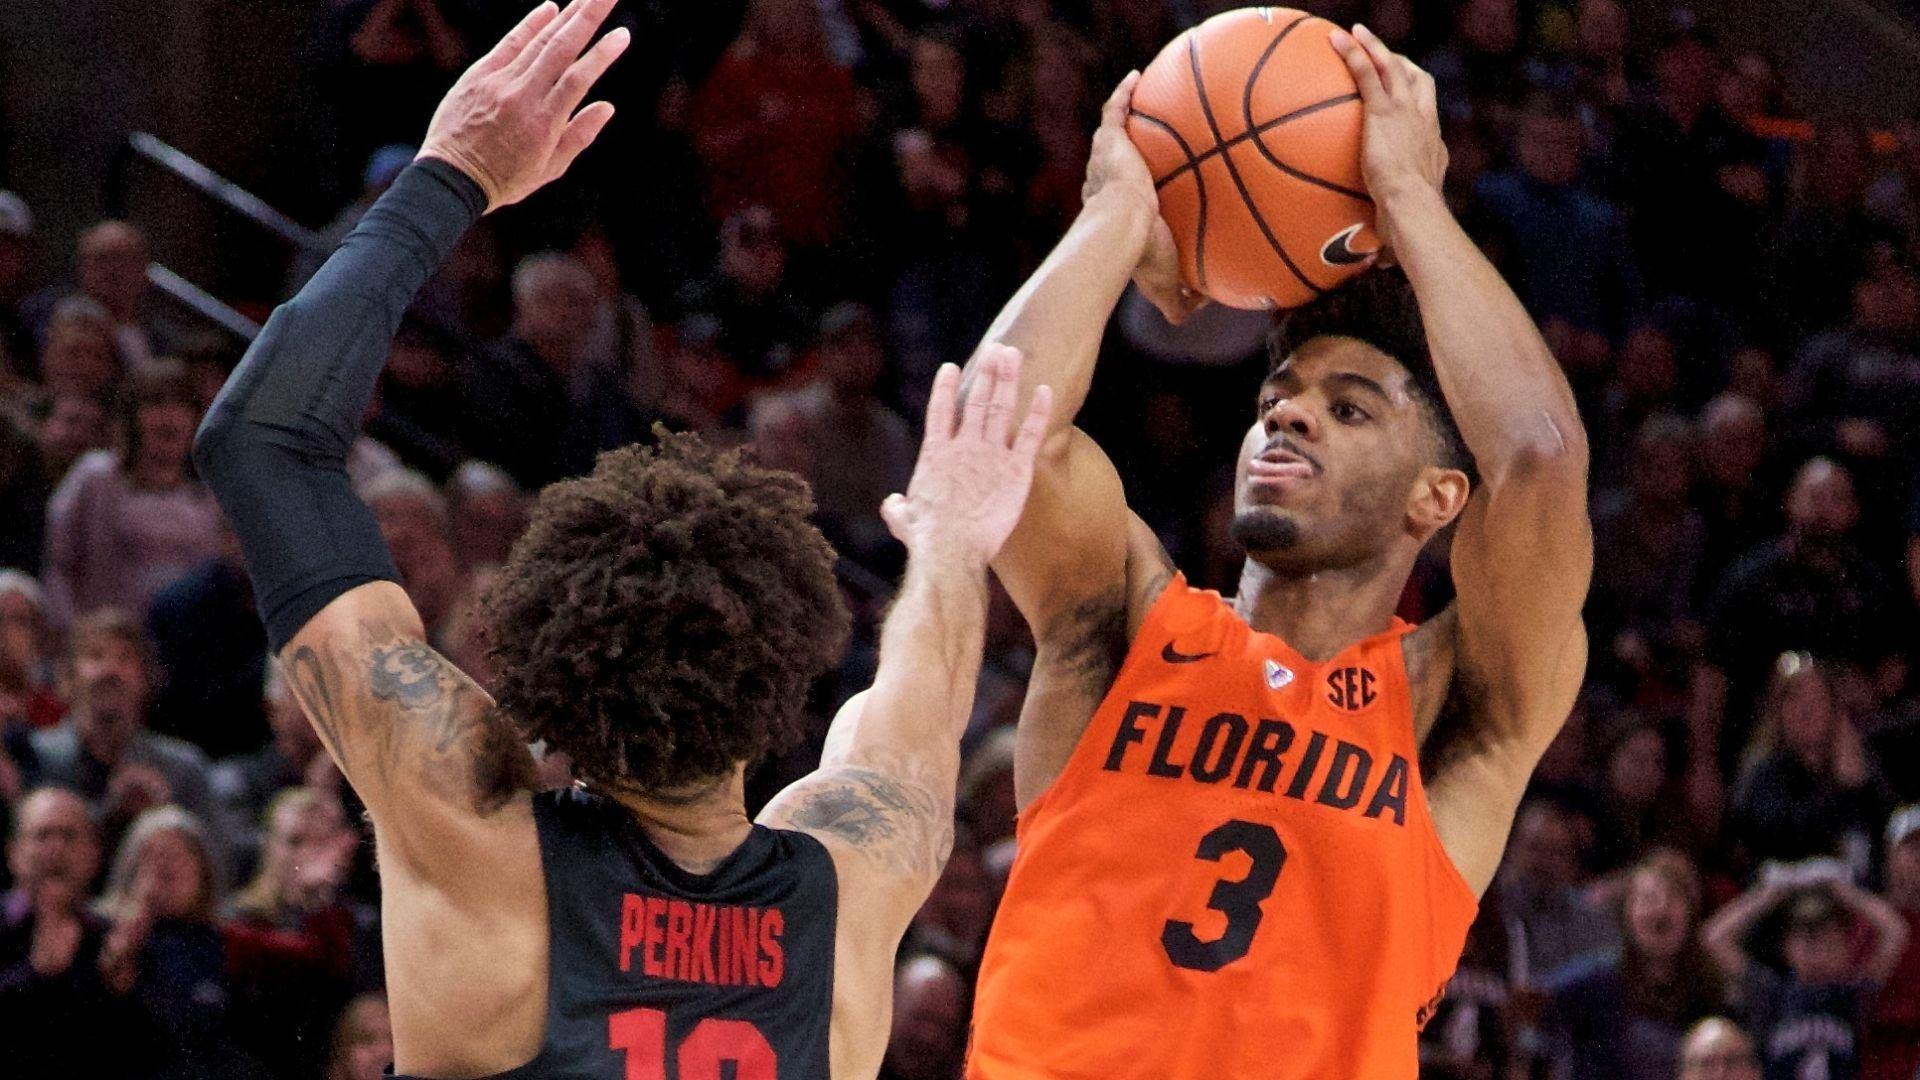 Florida tops Gonzaga in double overtime